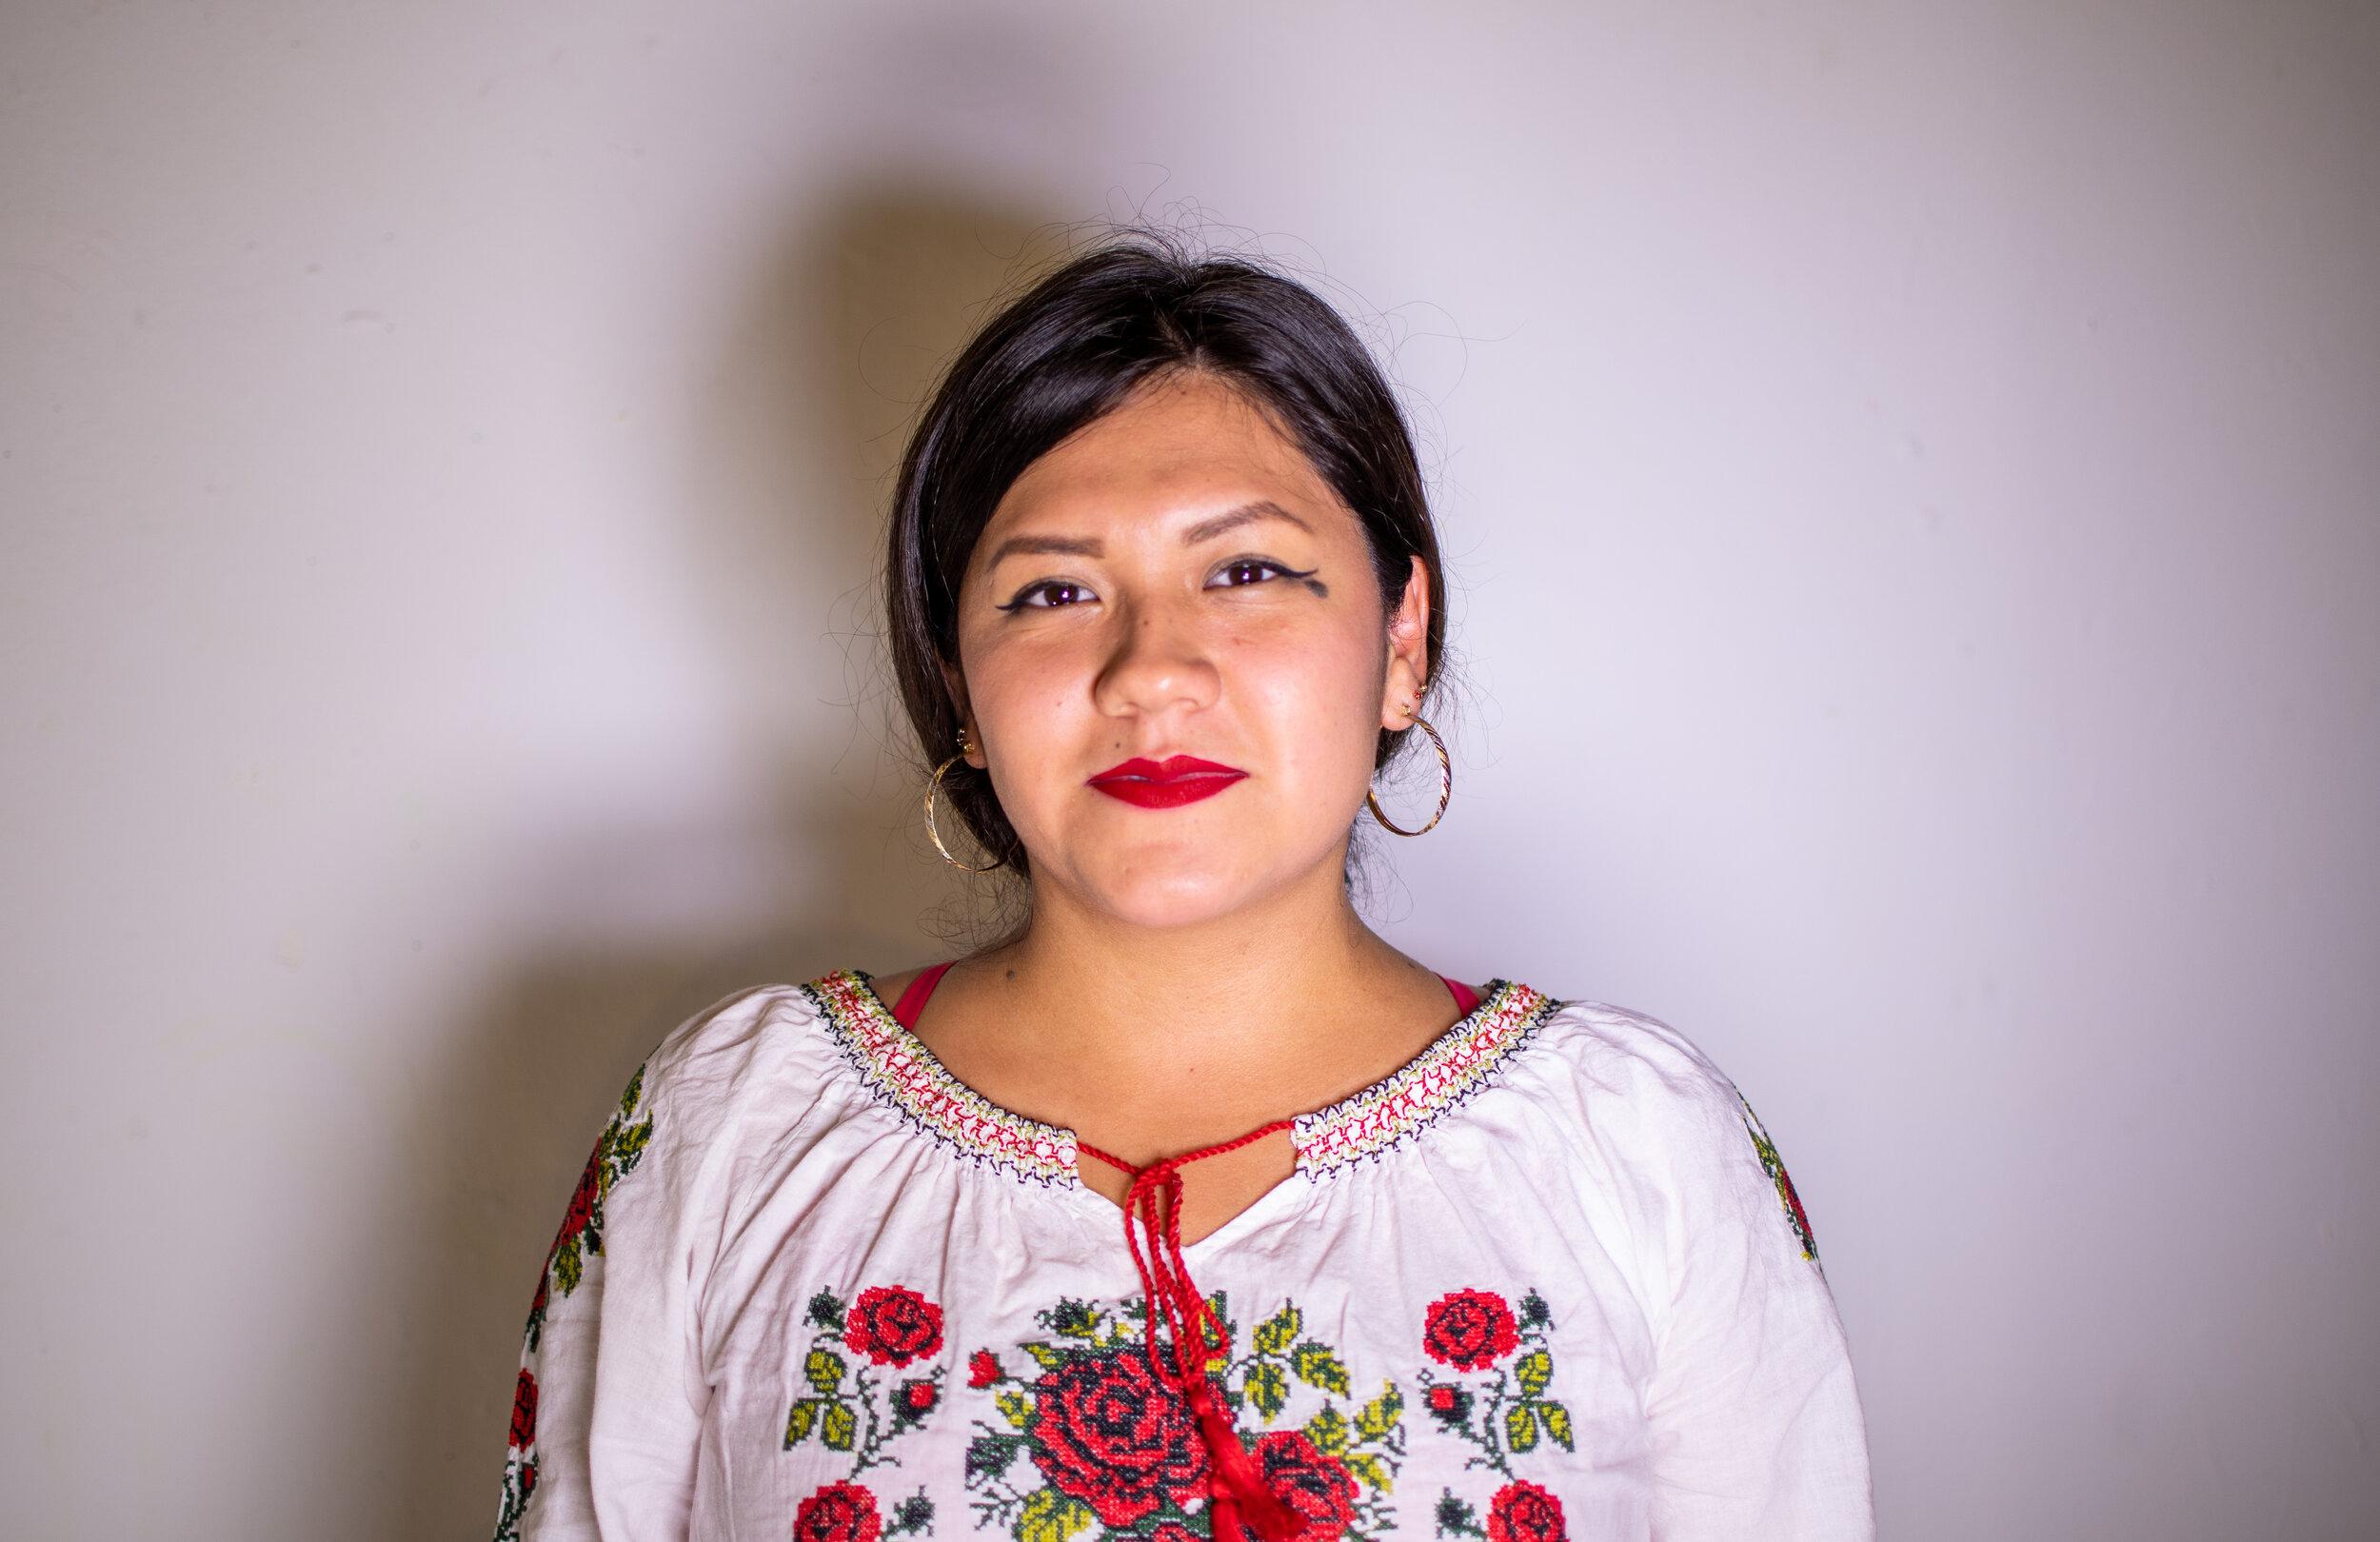 Olivia Vazquez Ponce '21, she/her